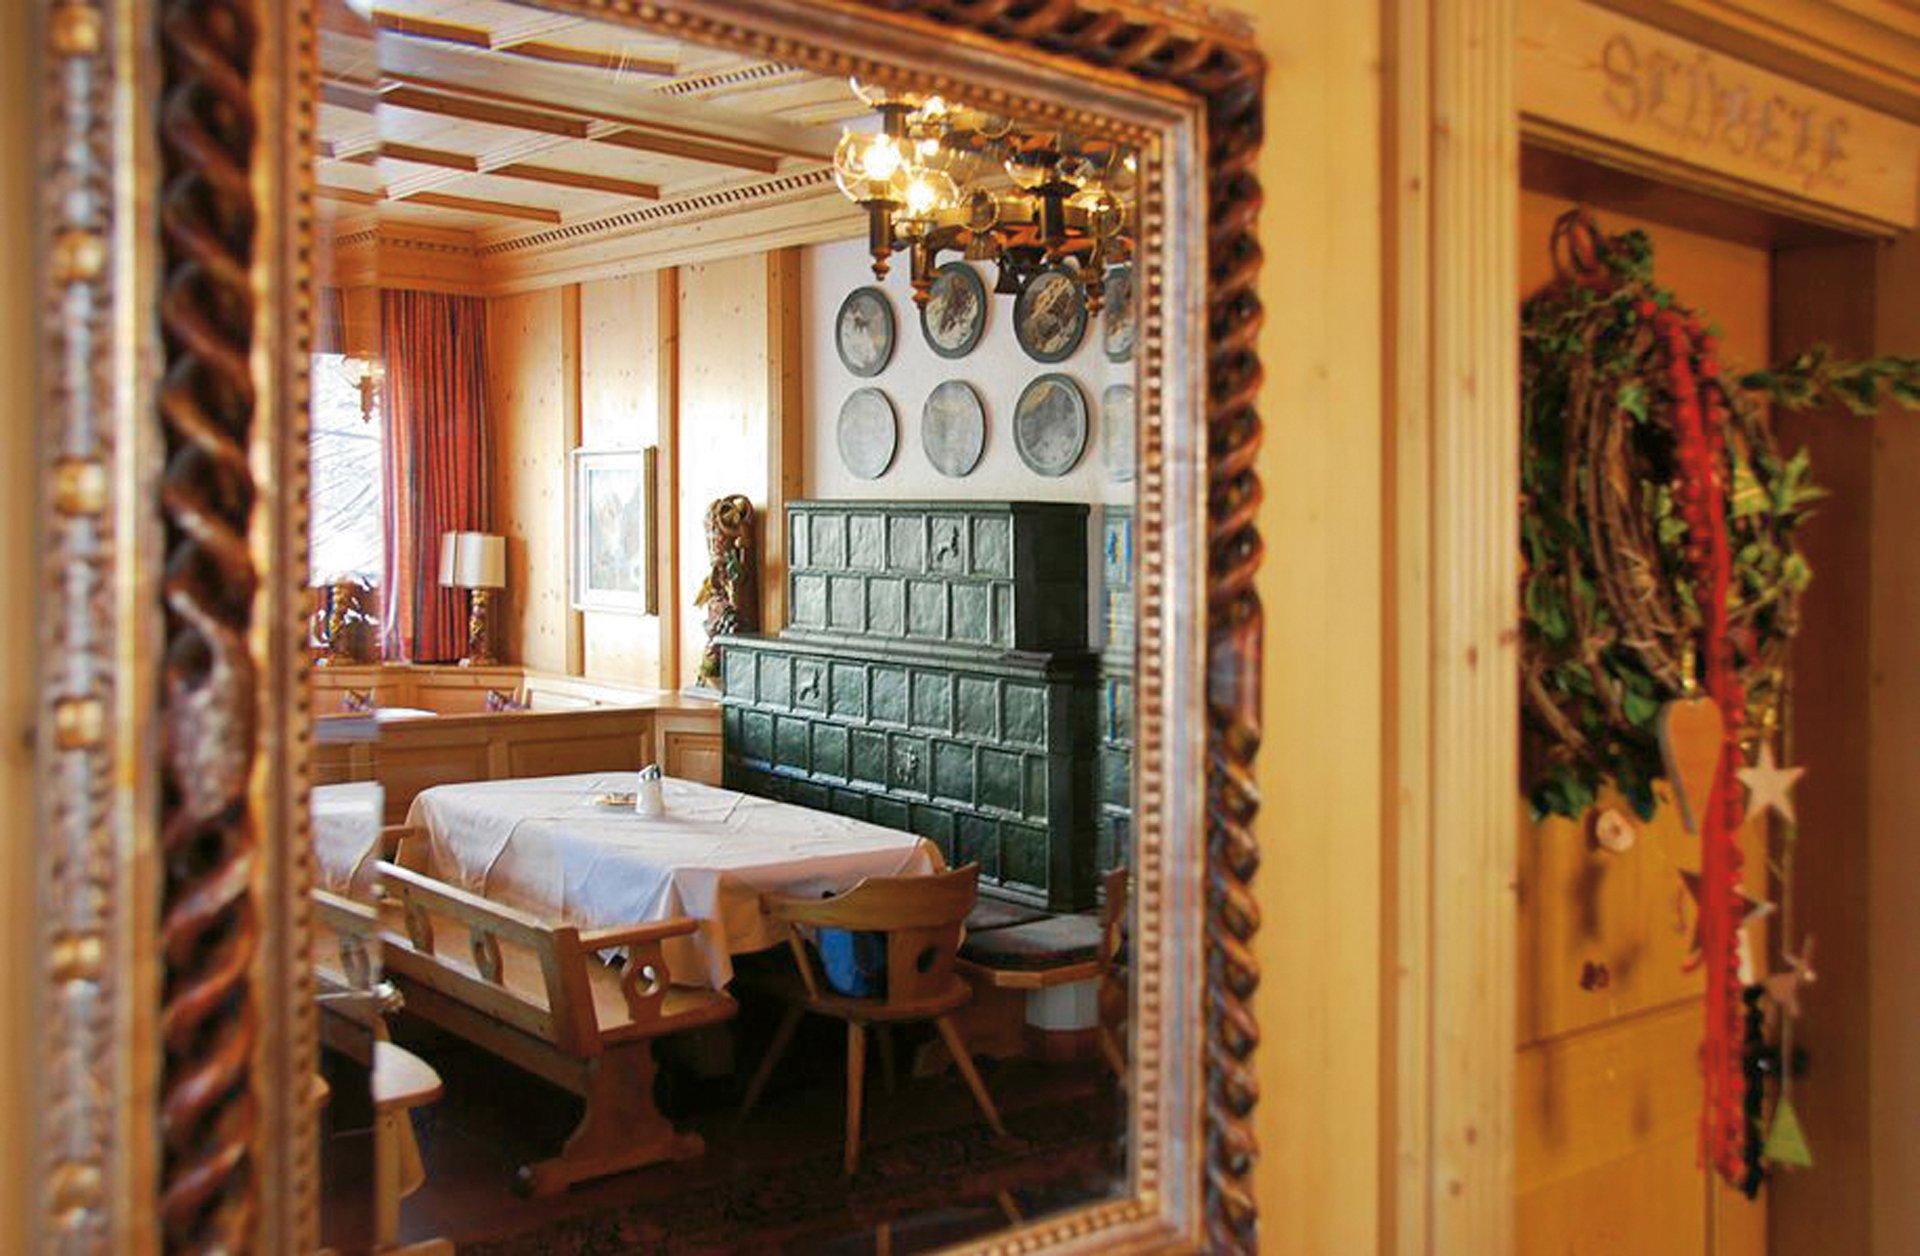 Alpenhotel Seiler Urlaub In K 252 Htai Tirol